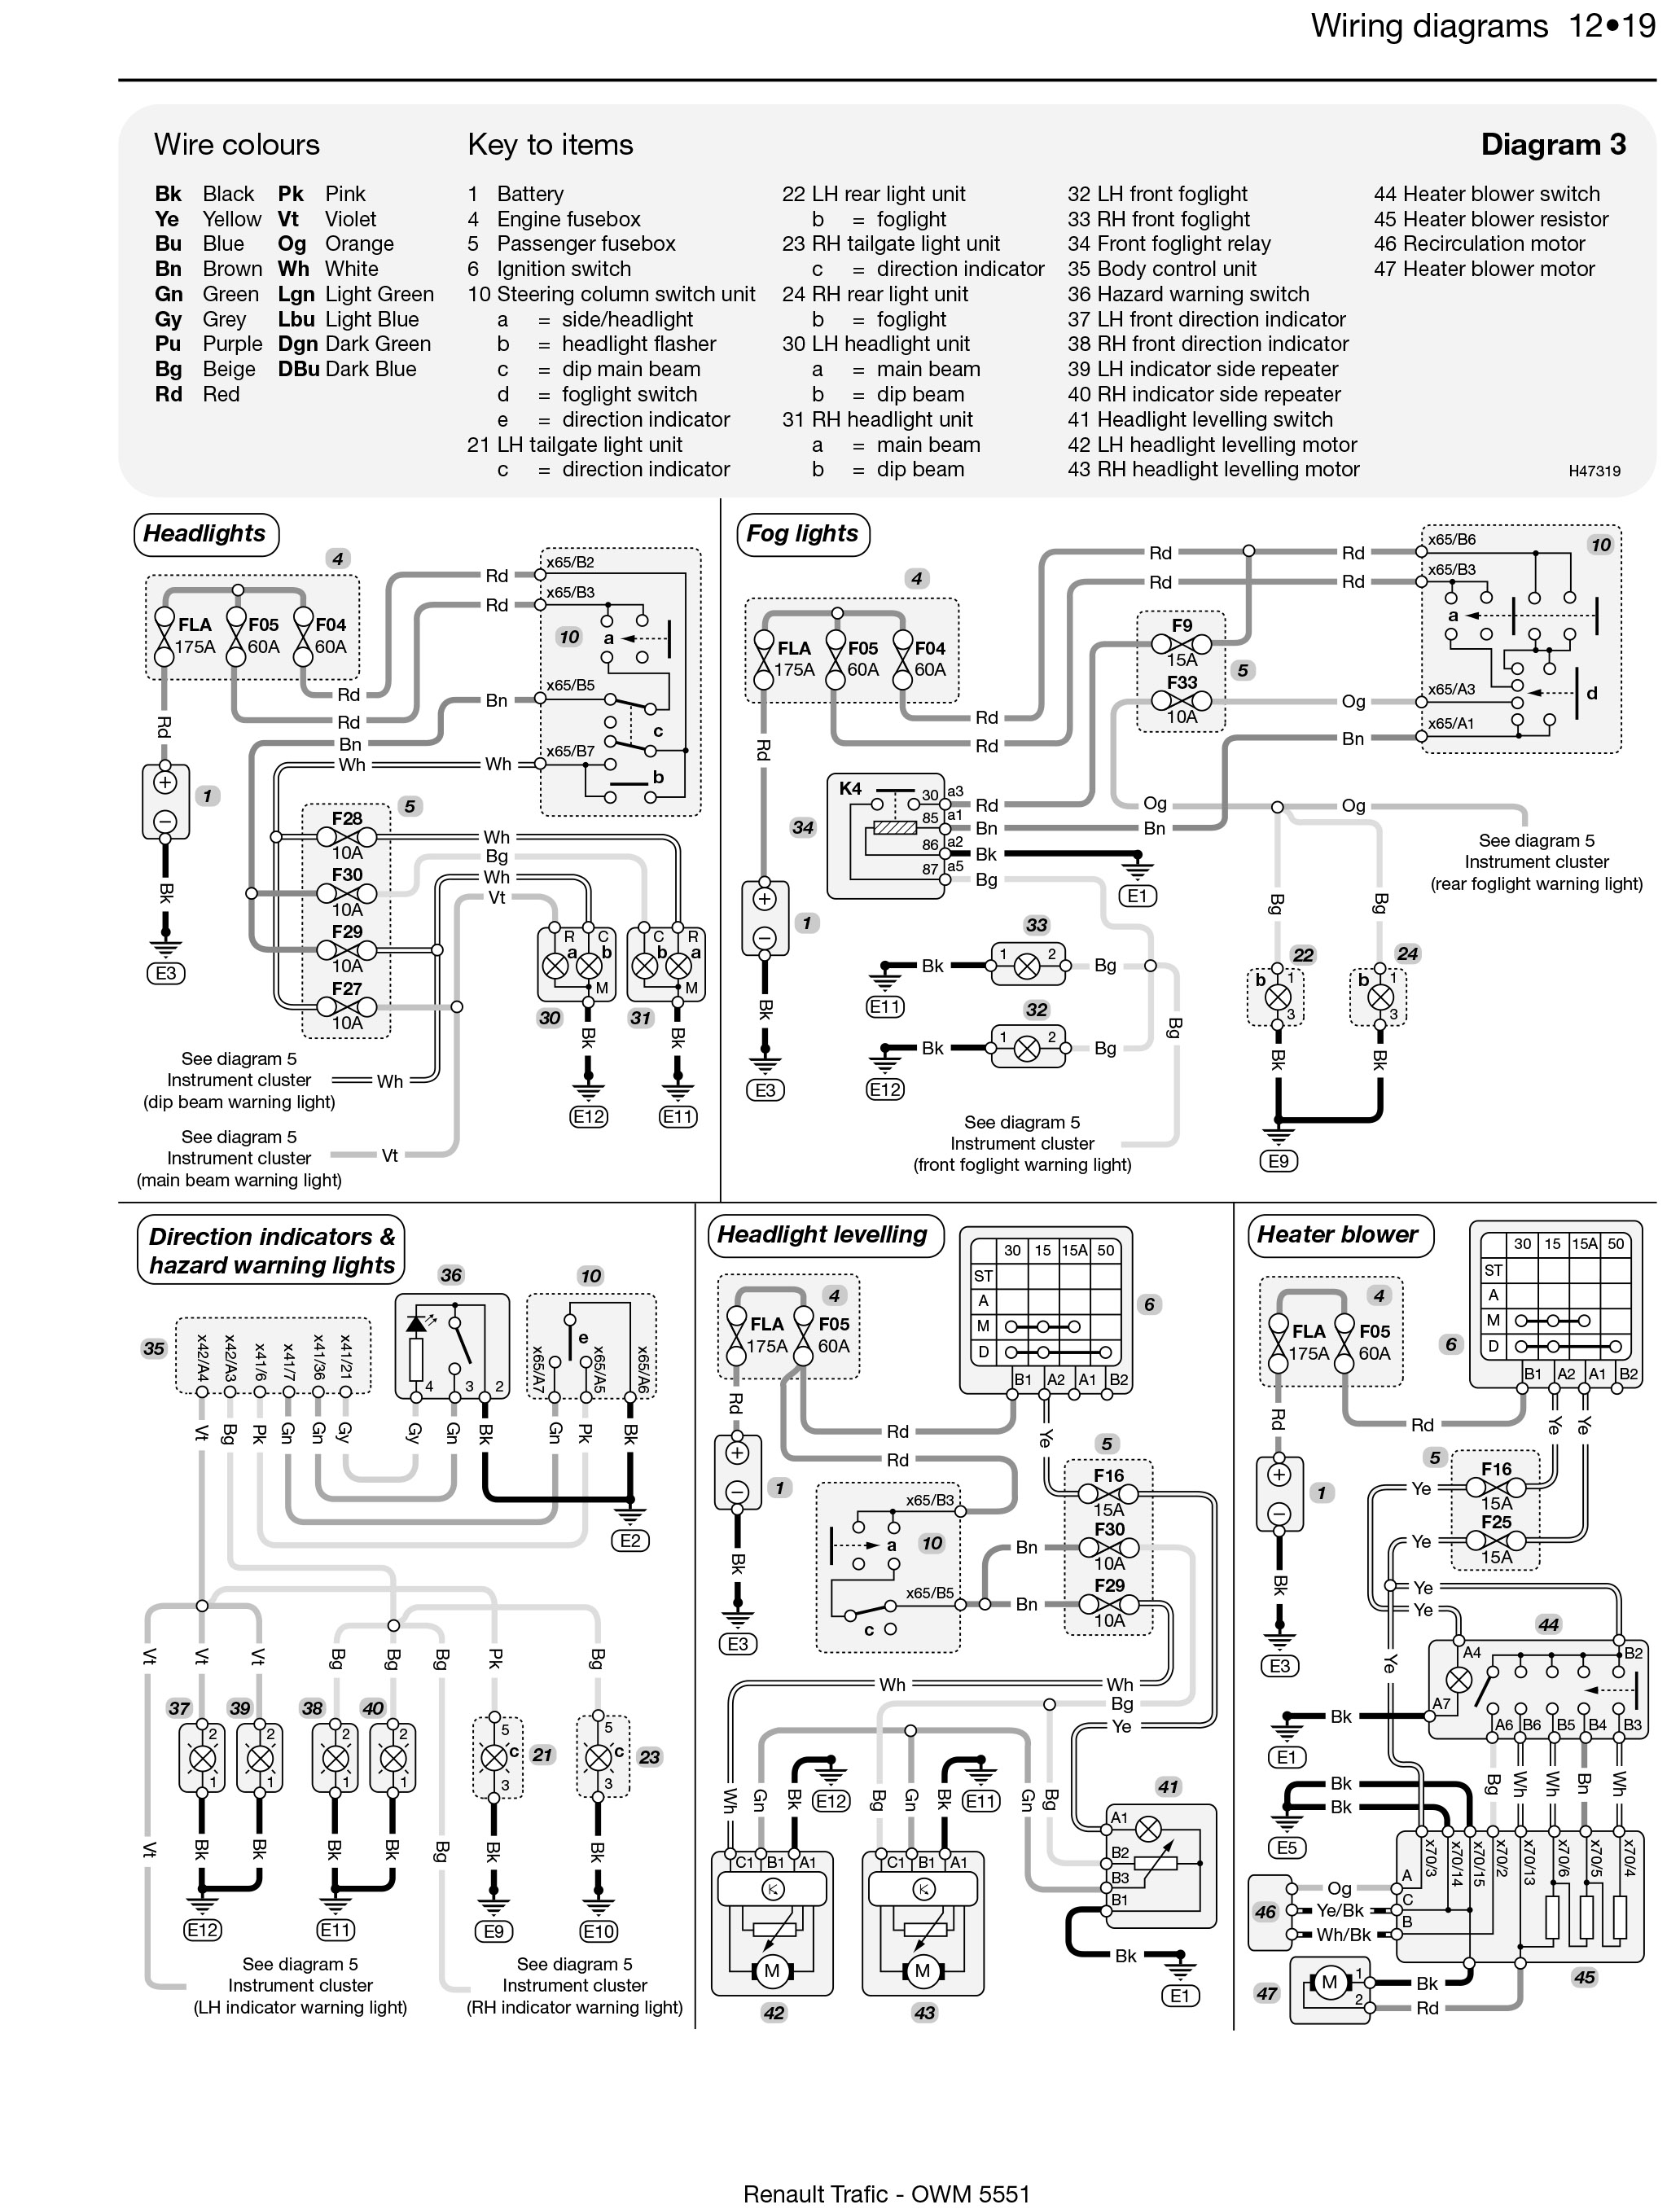 Haynes-5551-page-6_0 Renault Trafic Air Con Wiring Diagram on mitsubishi wiring diagrams, columbia wiring diagrams, volvo wiring diagrams, plymouth wiring diagrams, freightliner wiring diagrams, pontiac wiring diagrams, bmw wiring diagrams, kenworth wiring diagrams, assa abloy wiring diagrams, evinrude wiring diagrams, vw wiring diagrams, john deere wiring diagrams, ktm wiring diagrams, international wiring diagrams, mopar wiring diagrams, honda wiring diagrams, terex wiring diagrams, dodge wiring schematics diagrams, new holland wiring diagrams, peterbilt wiring diagrams,